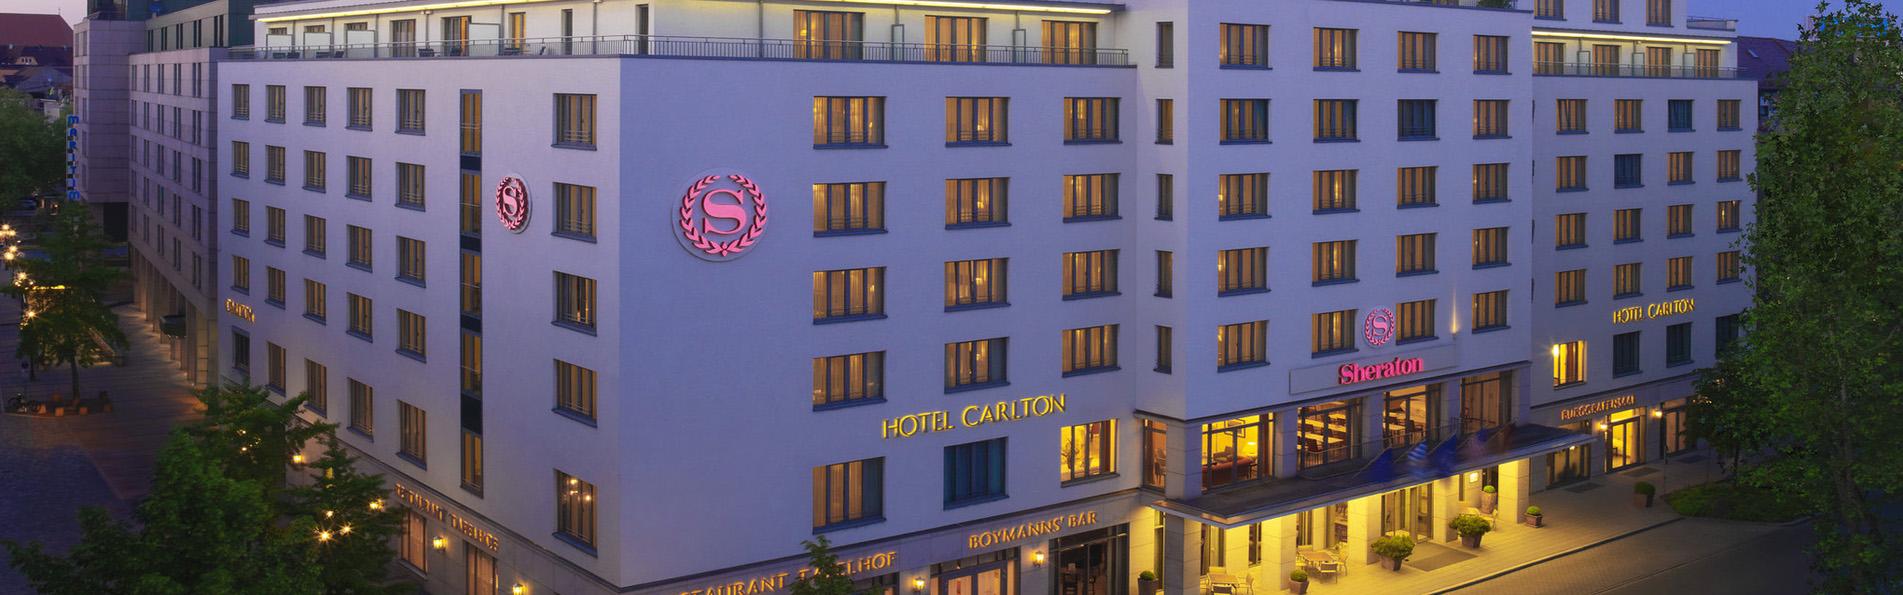 Arabella-Sheraton-Hotel-Carlton-2